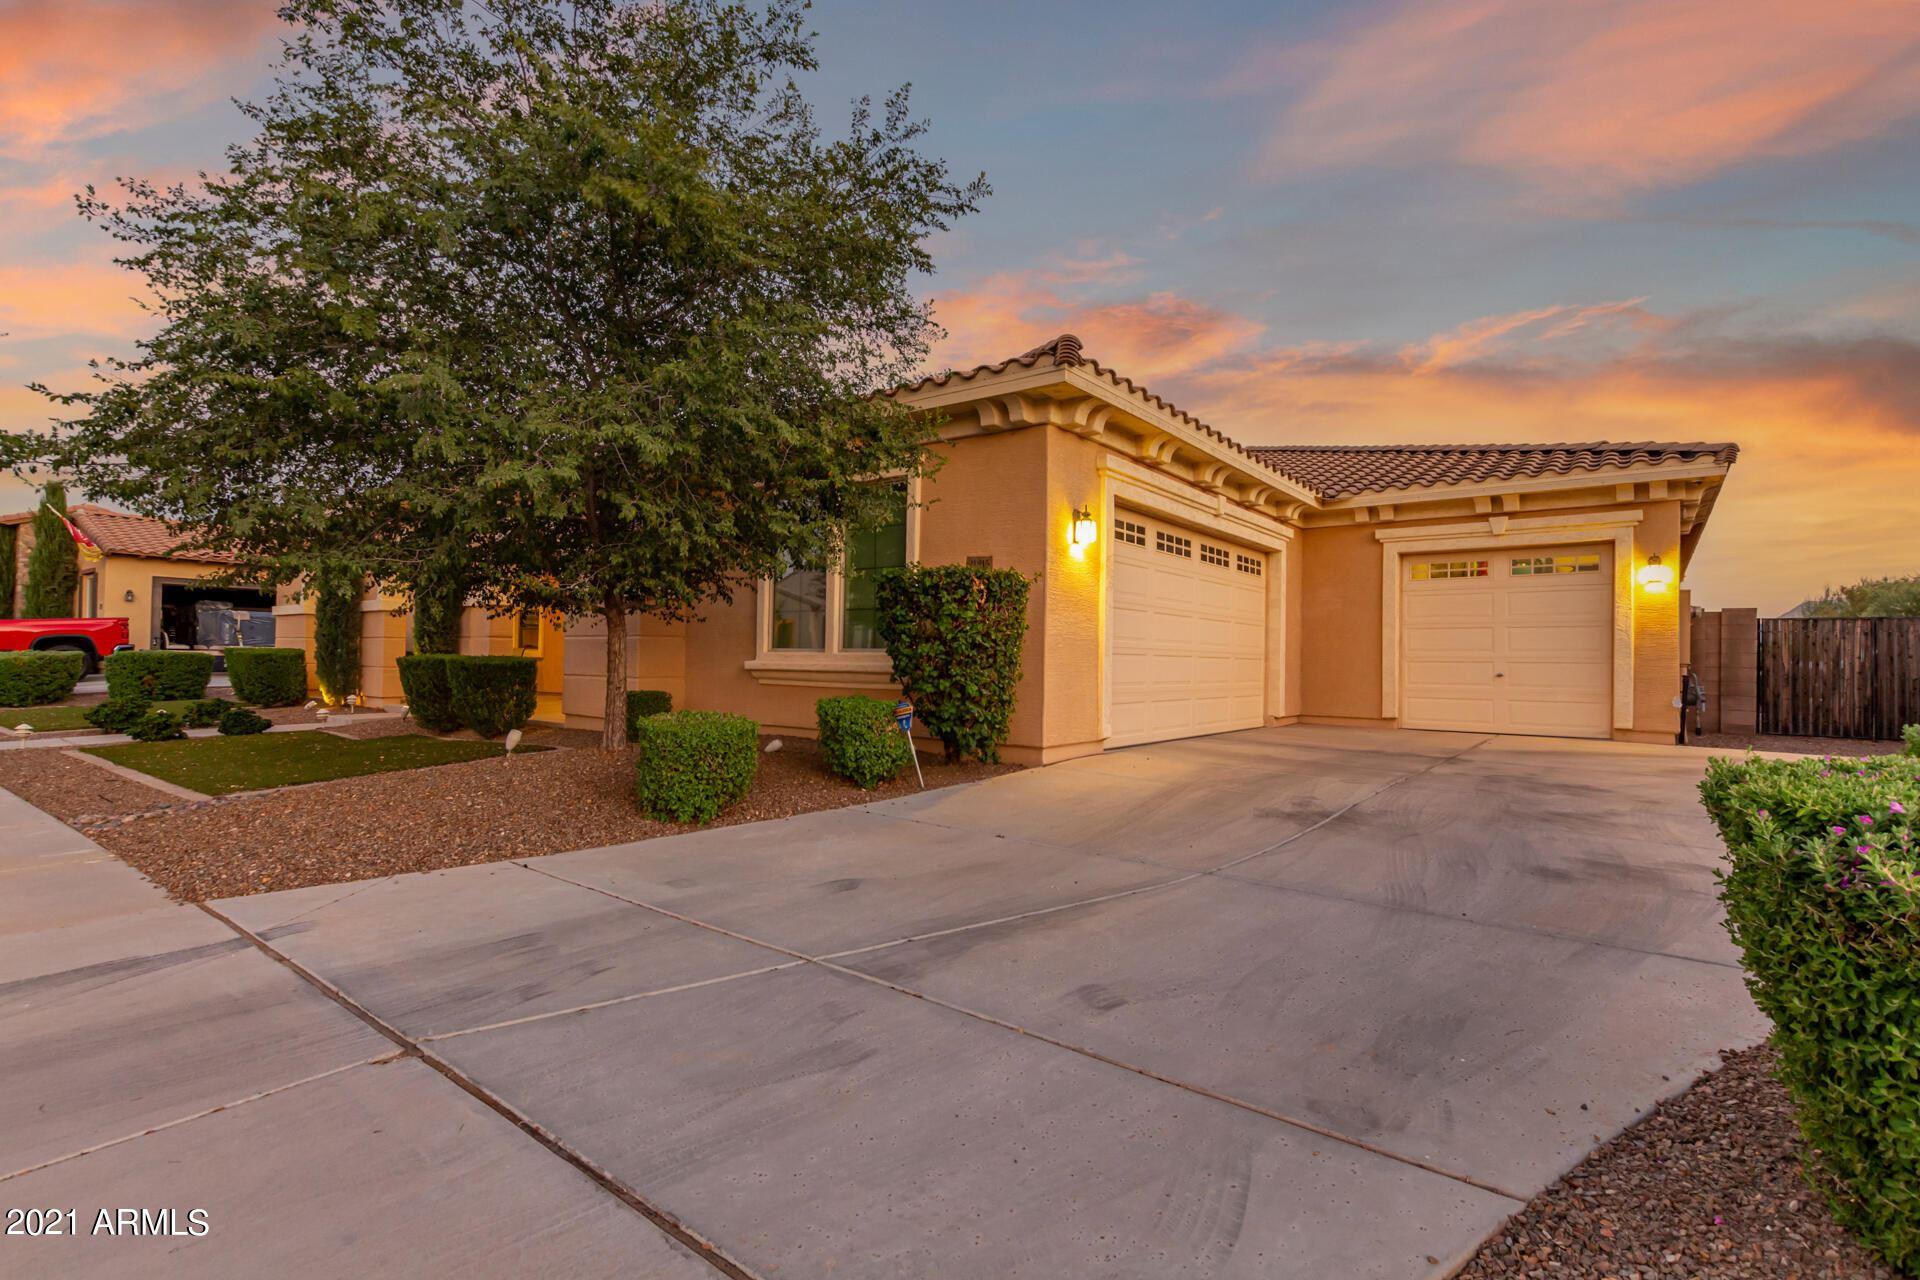 Photo of 21215 E MISTY Lane, Queen Creek, AZ 85142 (MLS # 6294539)